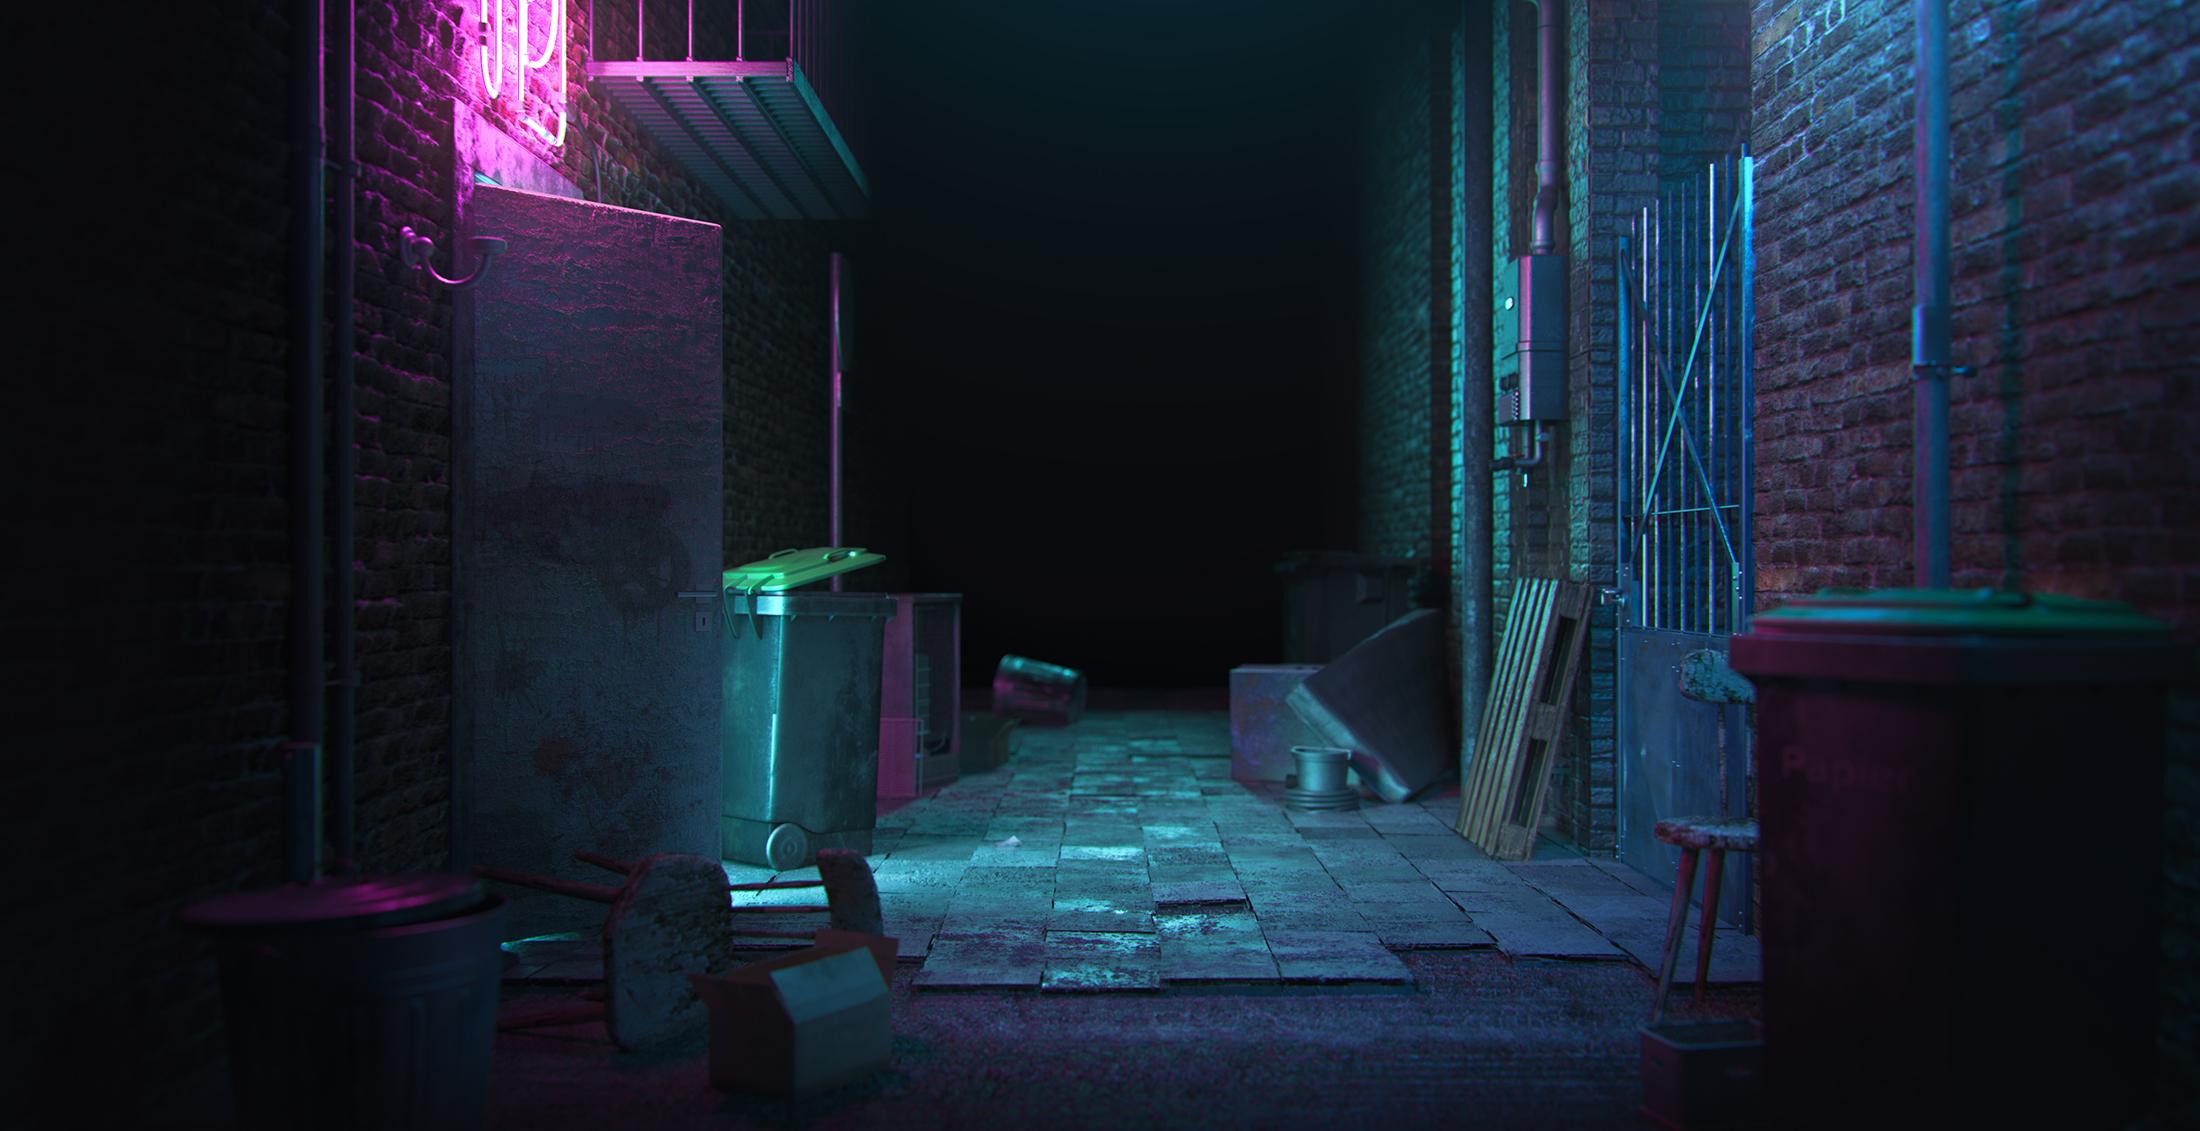 Street_Design04.jpg